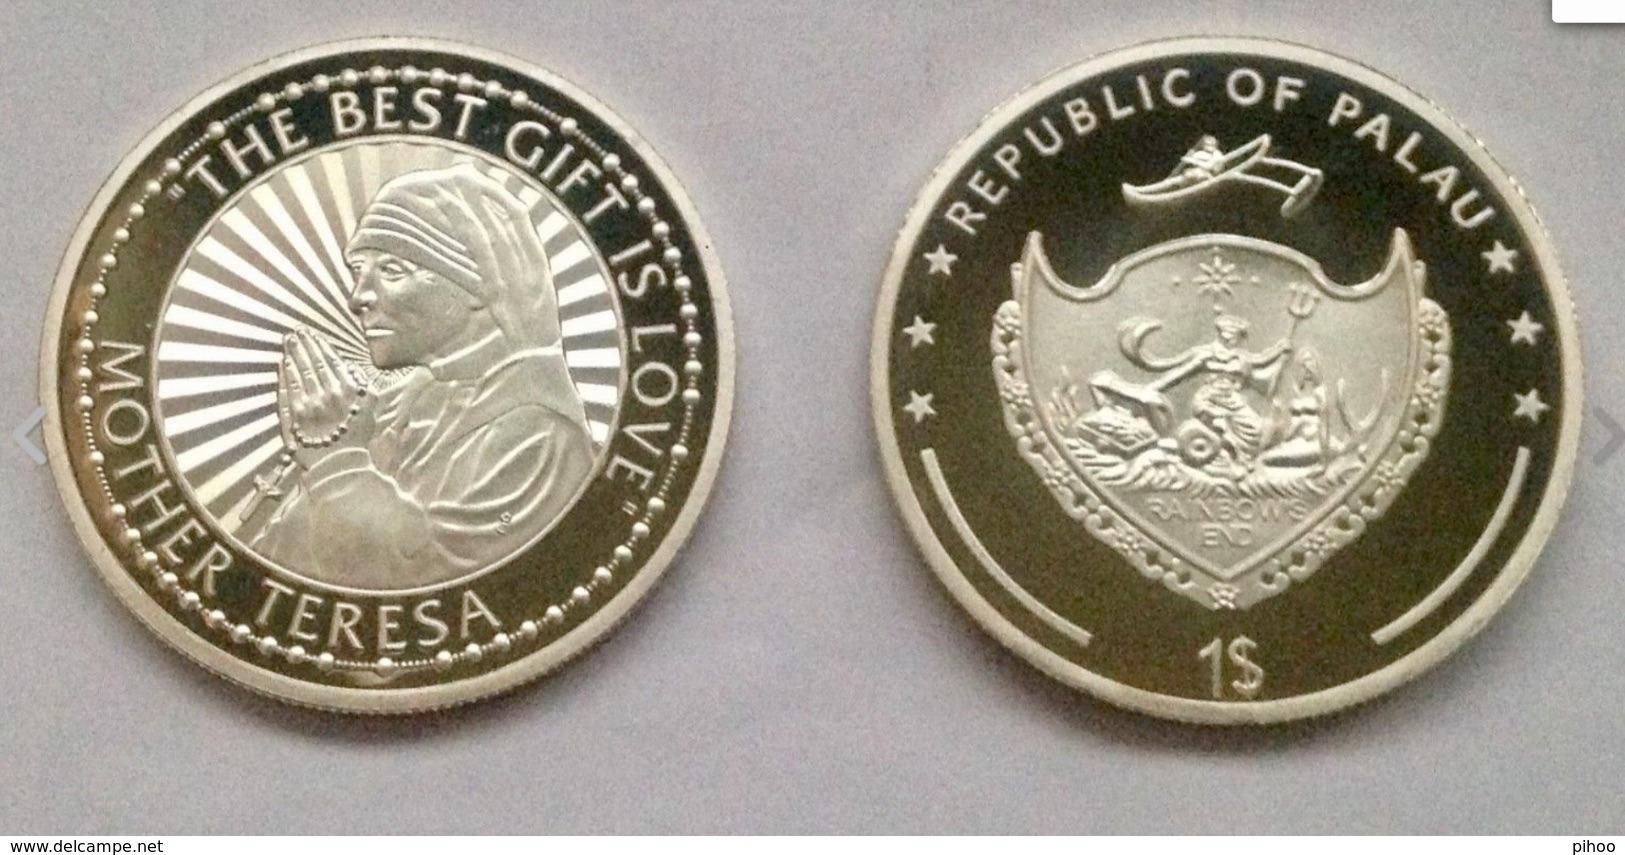 Silver Coin Mother Teresa Palau - Palau